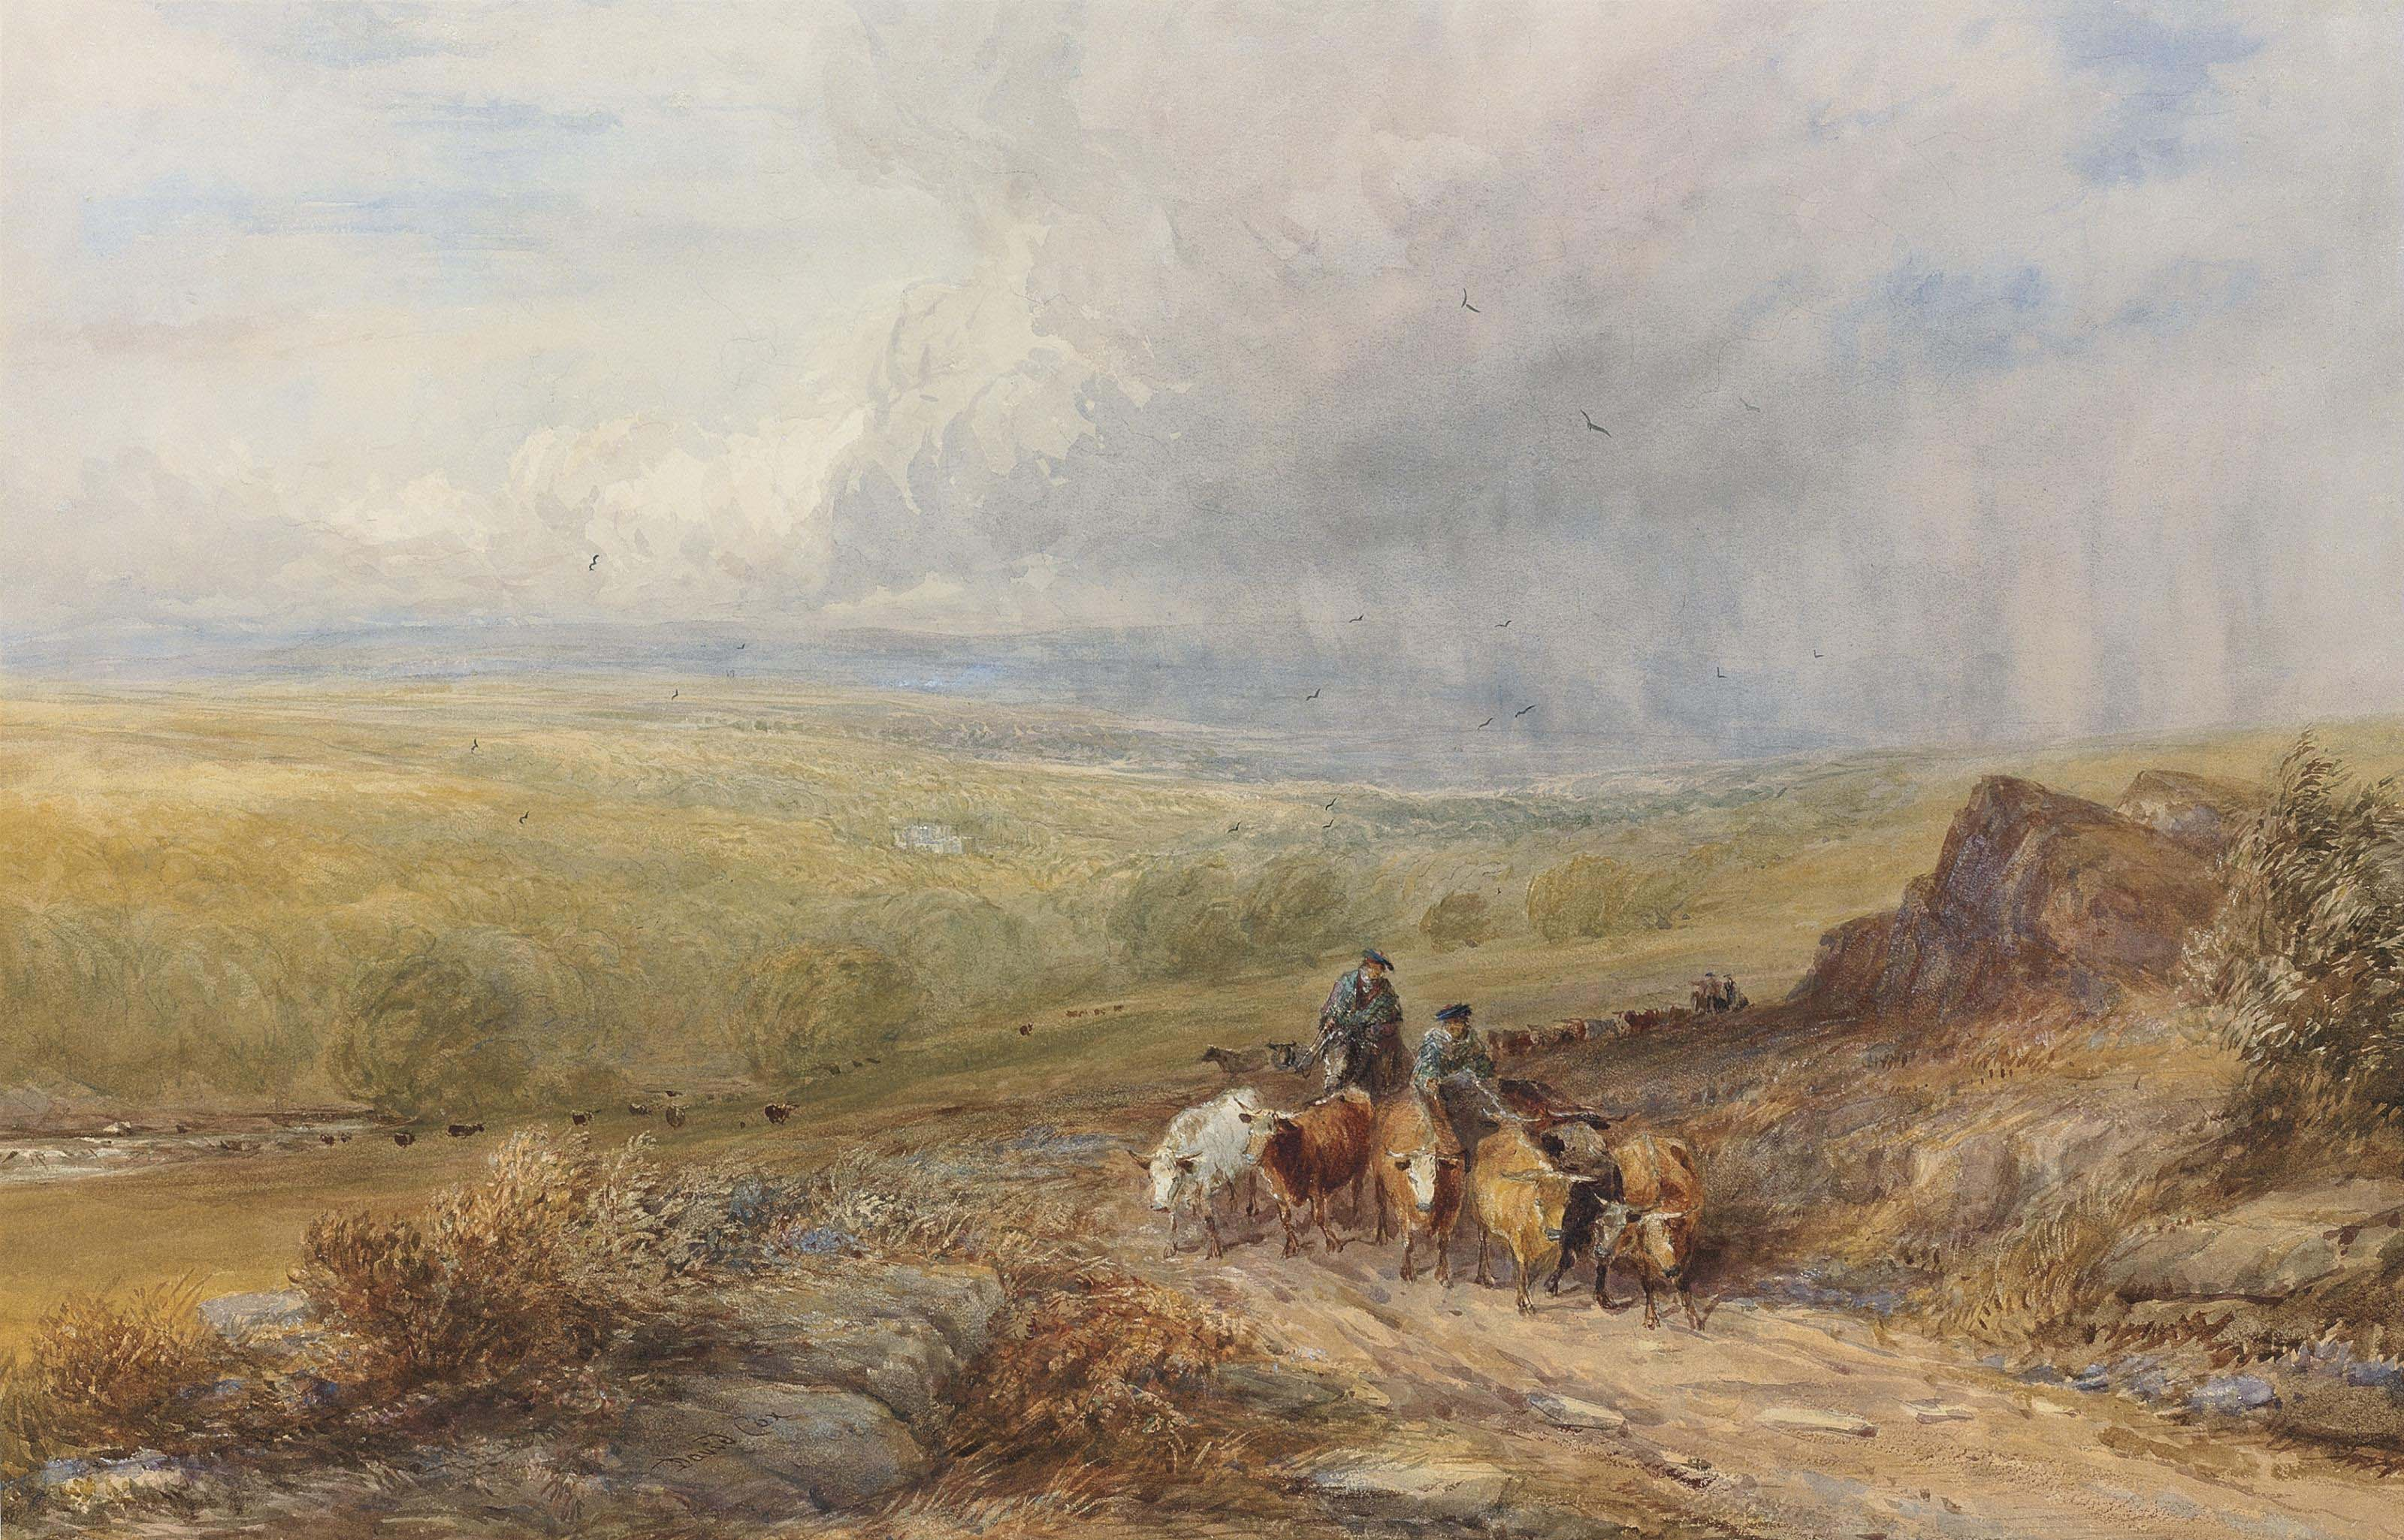 Drovers near Barden Castle on the Wharfe, Yorkshire